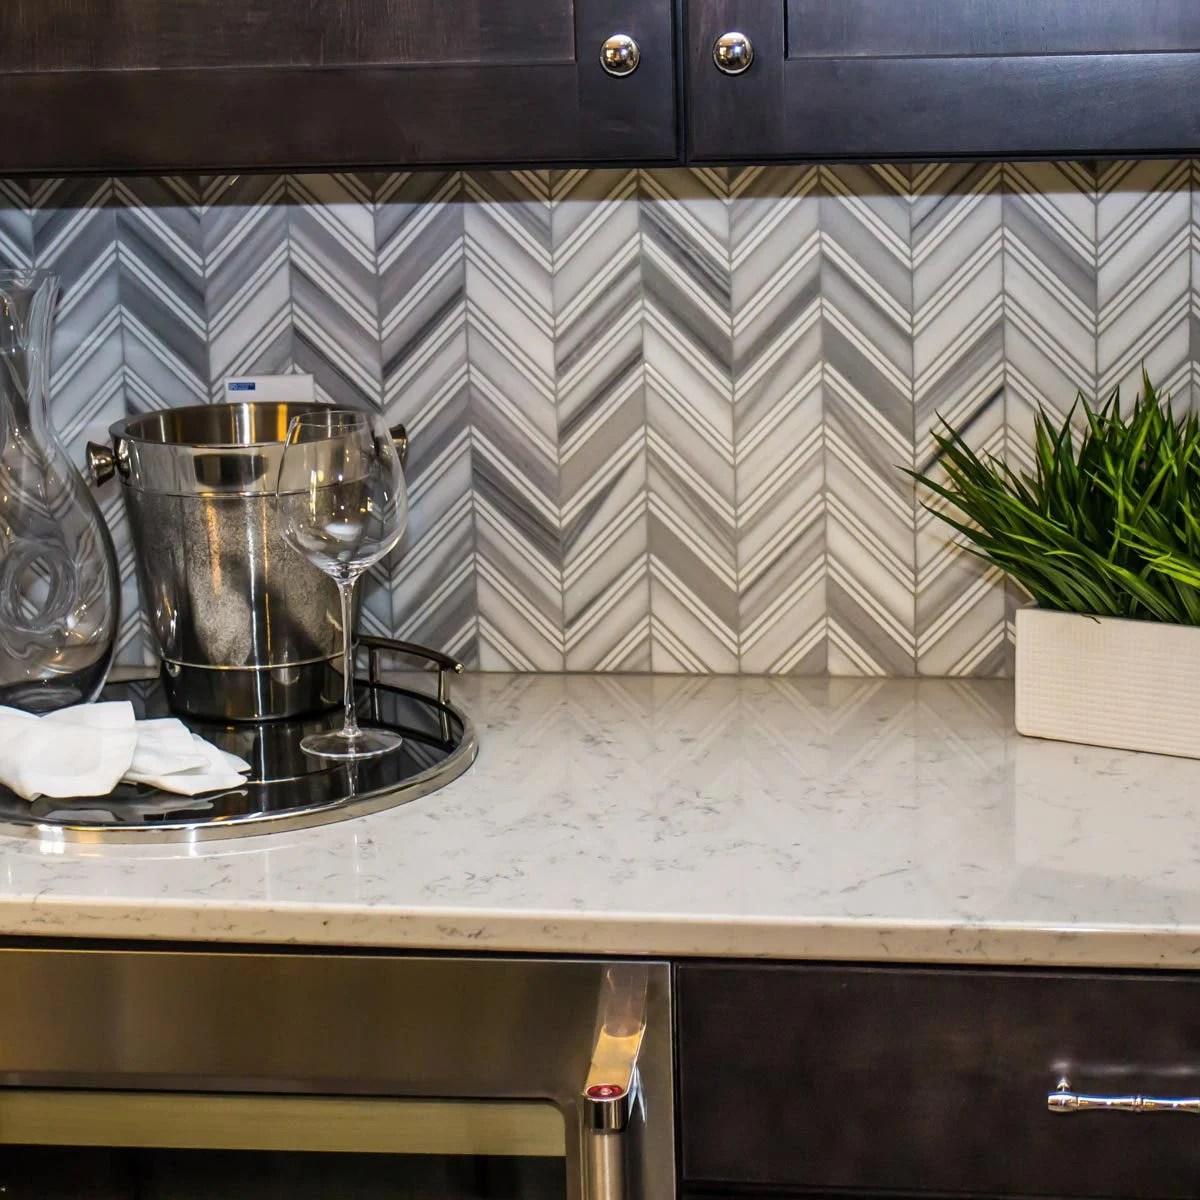 Best Kitchen Backsplash Ideas For Dark Cabinets | Family ... on Backsplash For Dark Countertops  id=28415